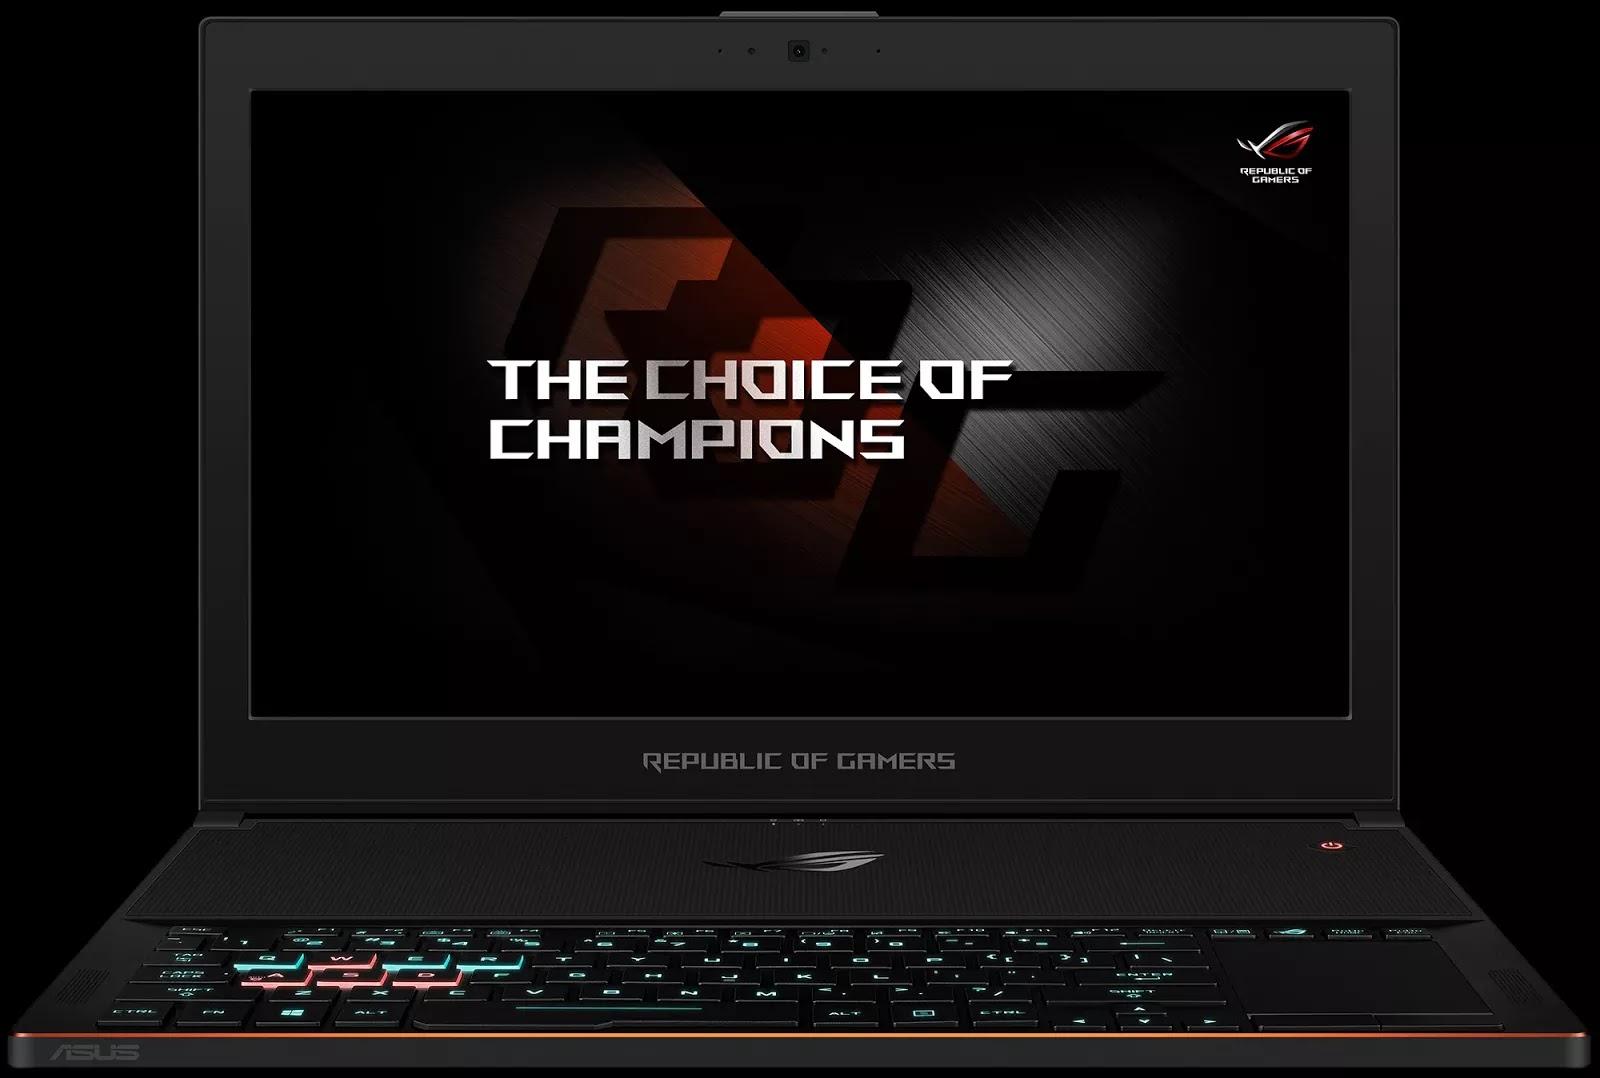 Asus เปิดตัวโน้ตบุ๊คสำหรับเล่นเกมที่บางที่สุดในโลก ROG ZEPHYRUS